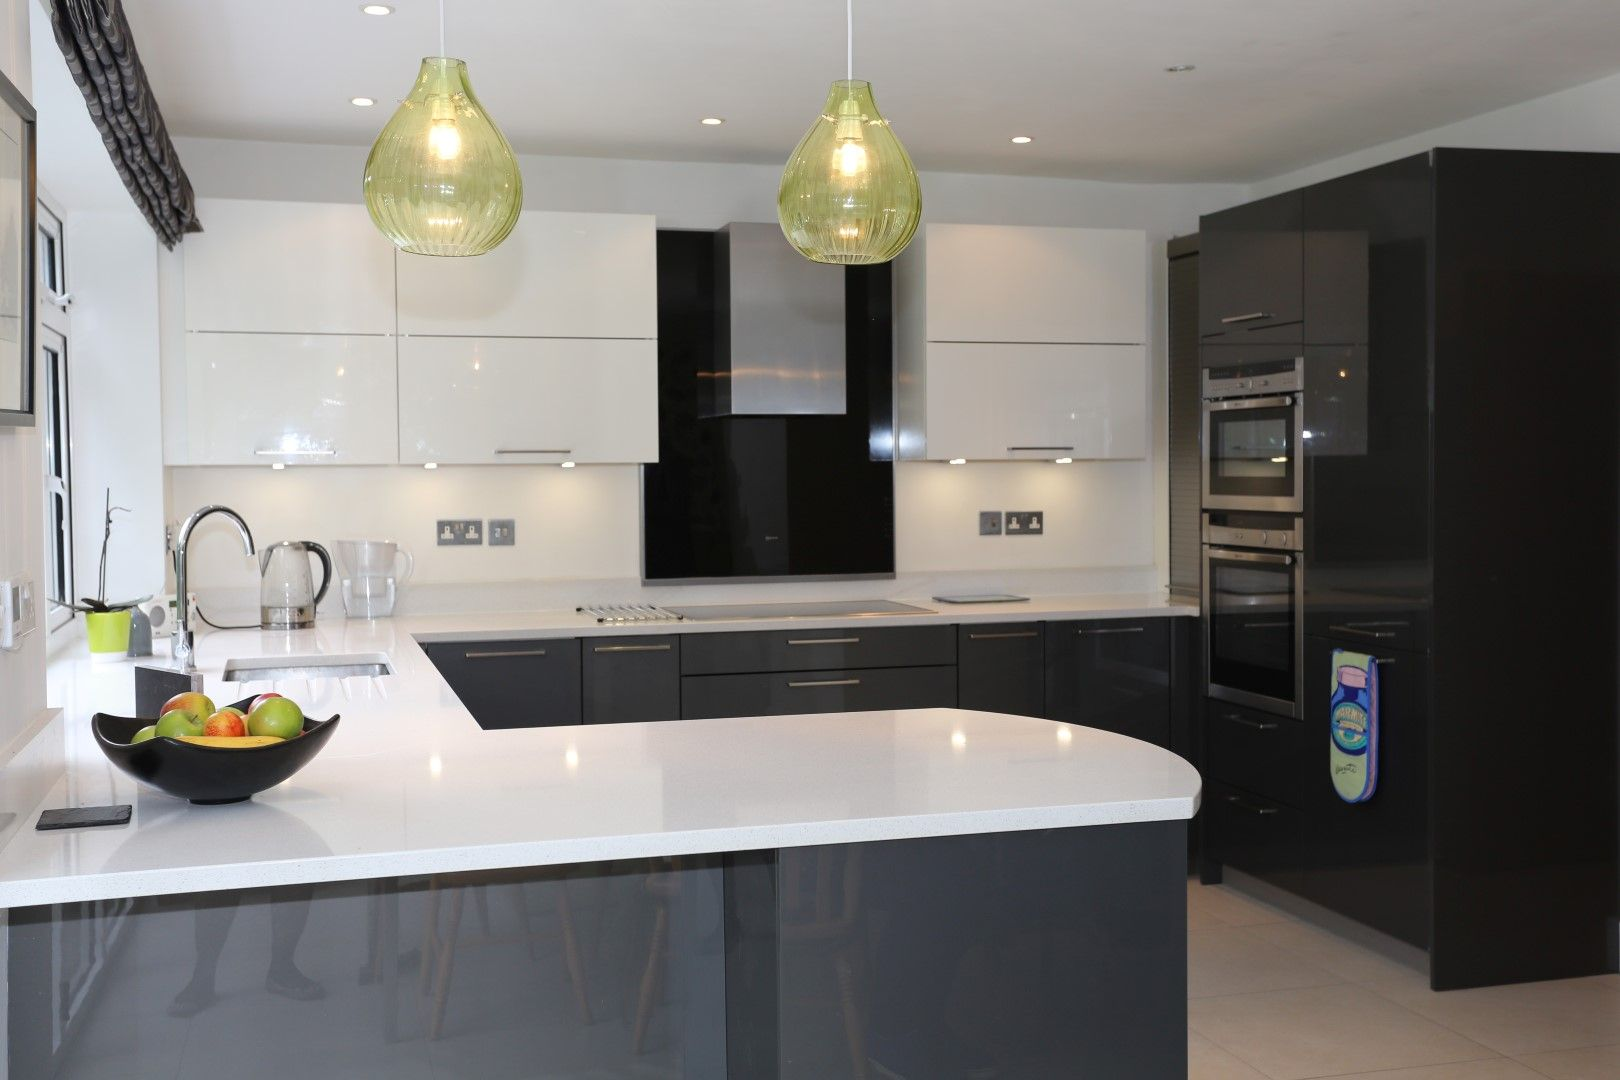 Glossy Kitchen Worktops And Kitchen Doors In 2020 Glossy Kitchen Grey Gloss Kitchen Modern Kitchen Cupboards